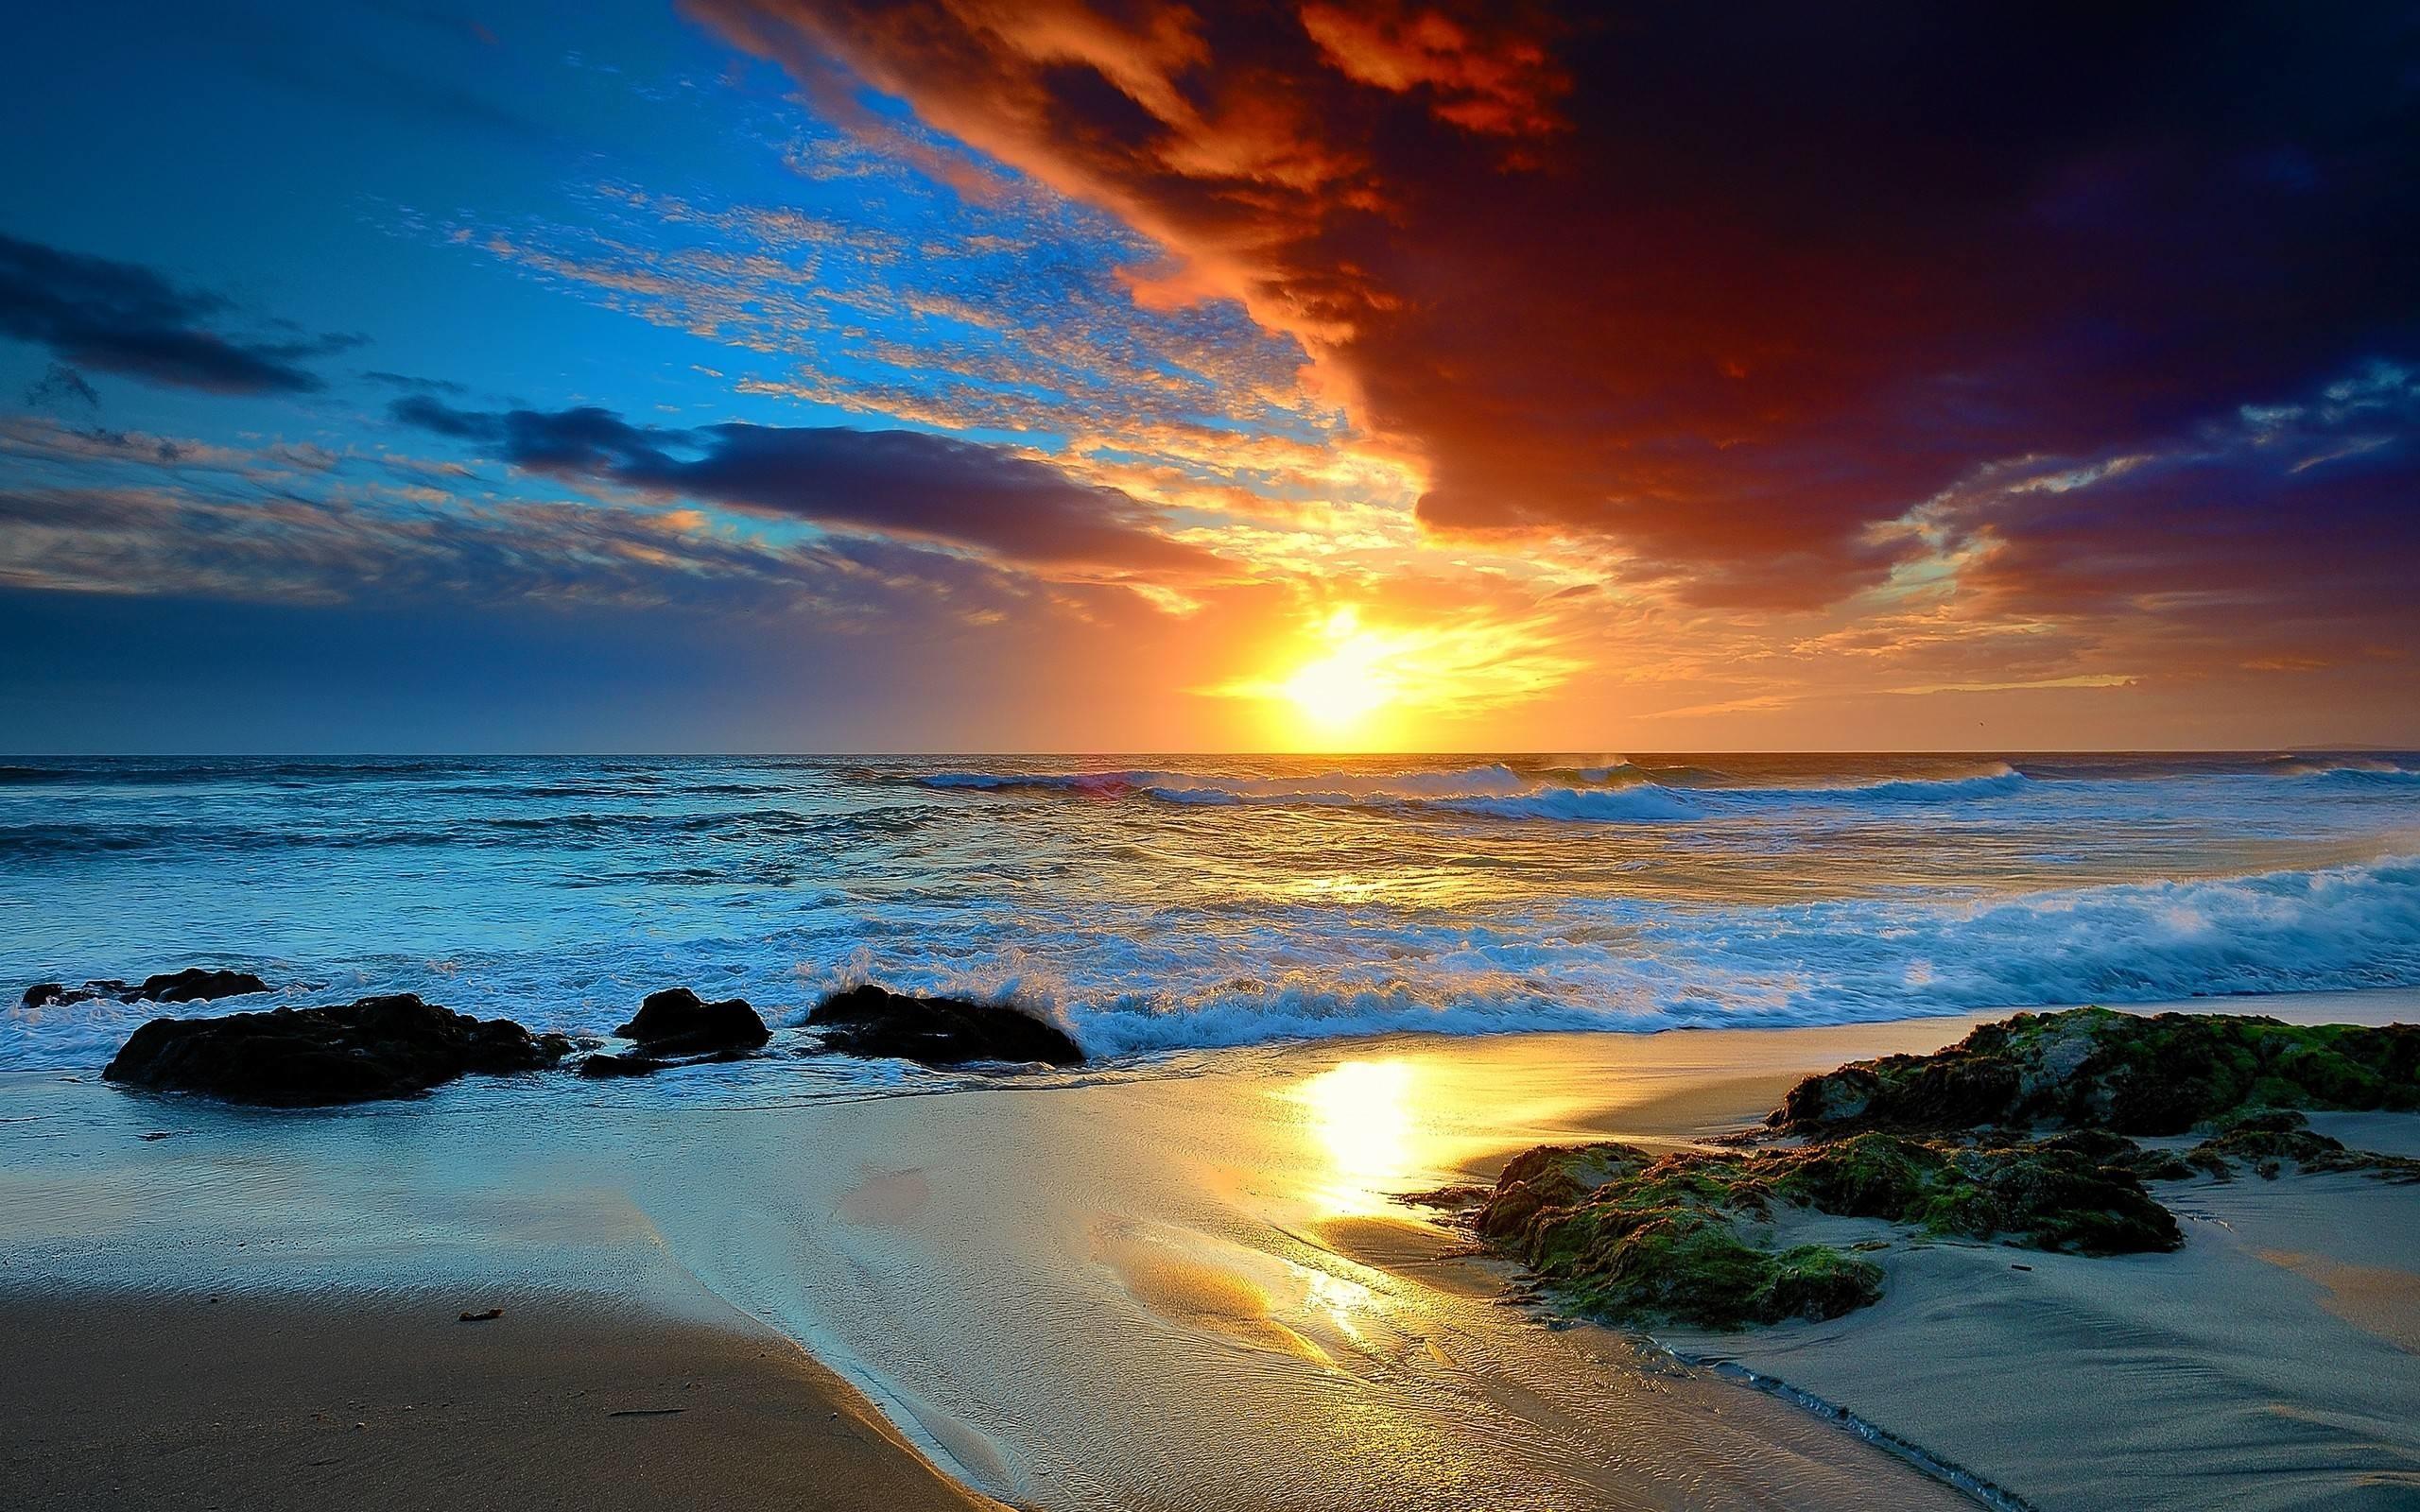 Twilight landscape beautiful sunset coast desktop wallpaper Gallery 2560x1600